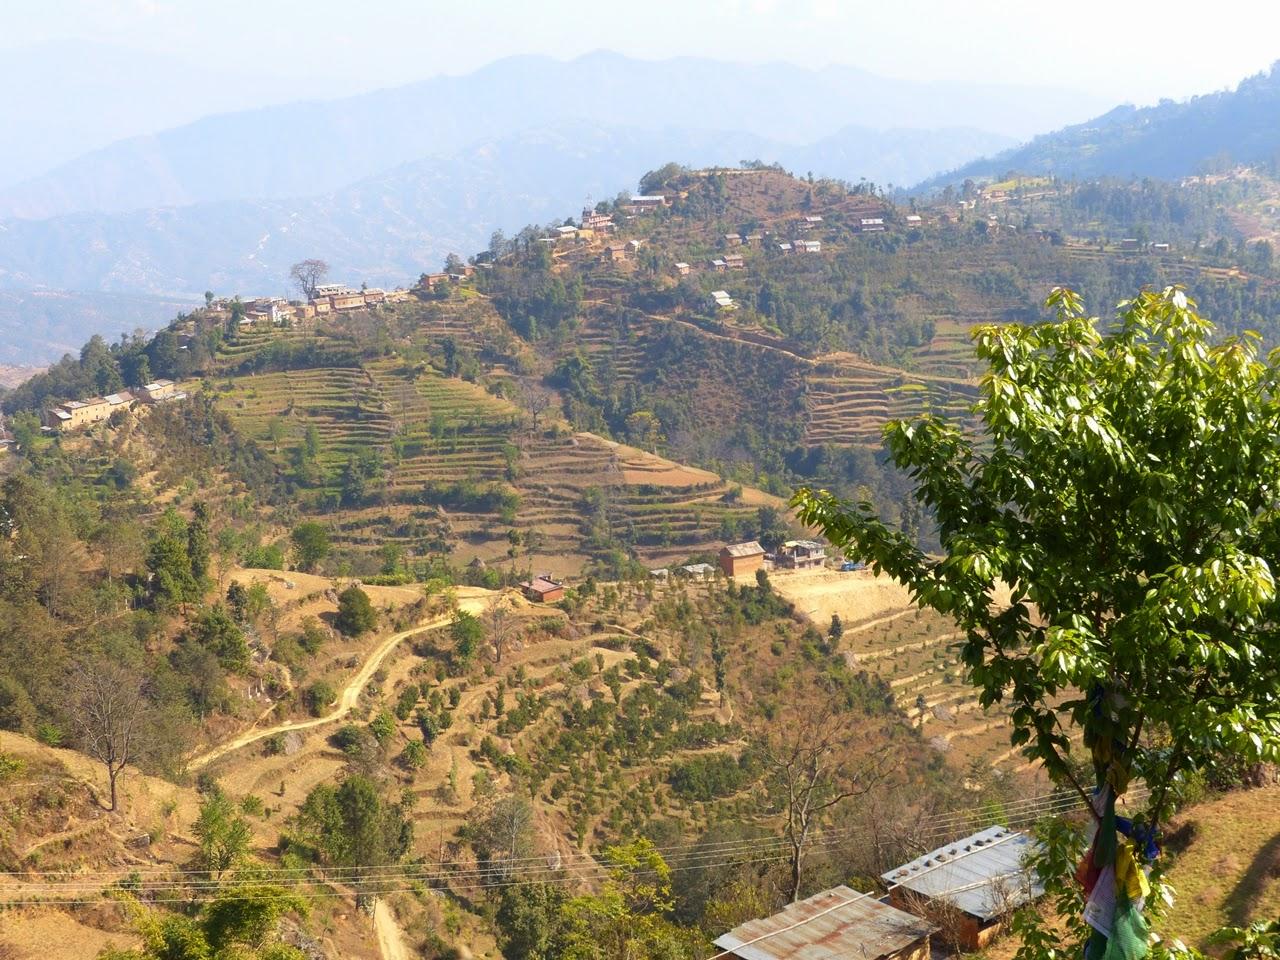 Surrounding hills and rice terraces view from Namobuddha, Nepal